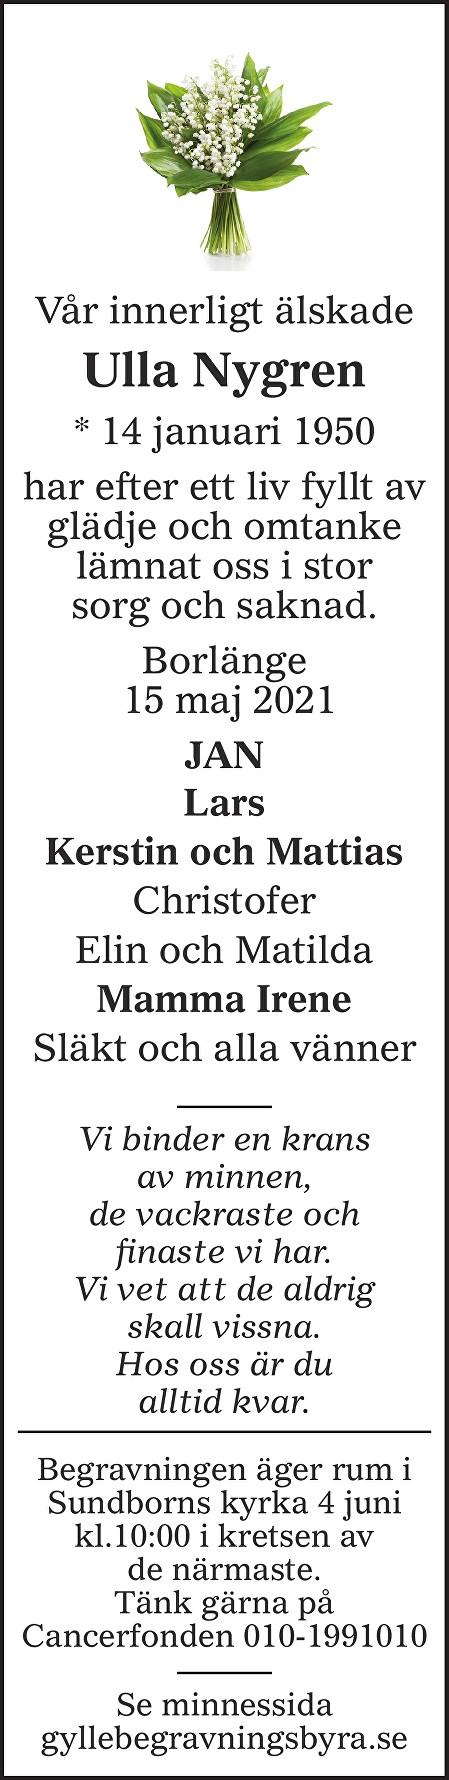 Ulla Nygren Death notice